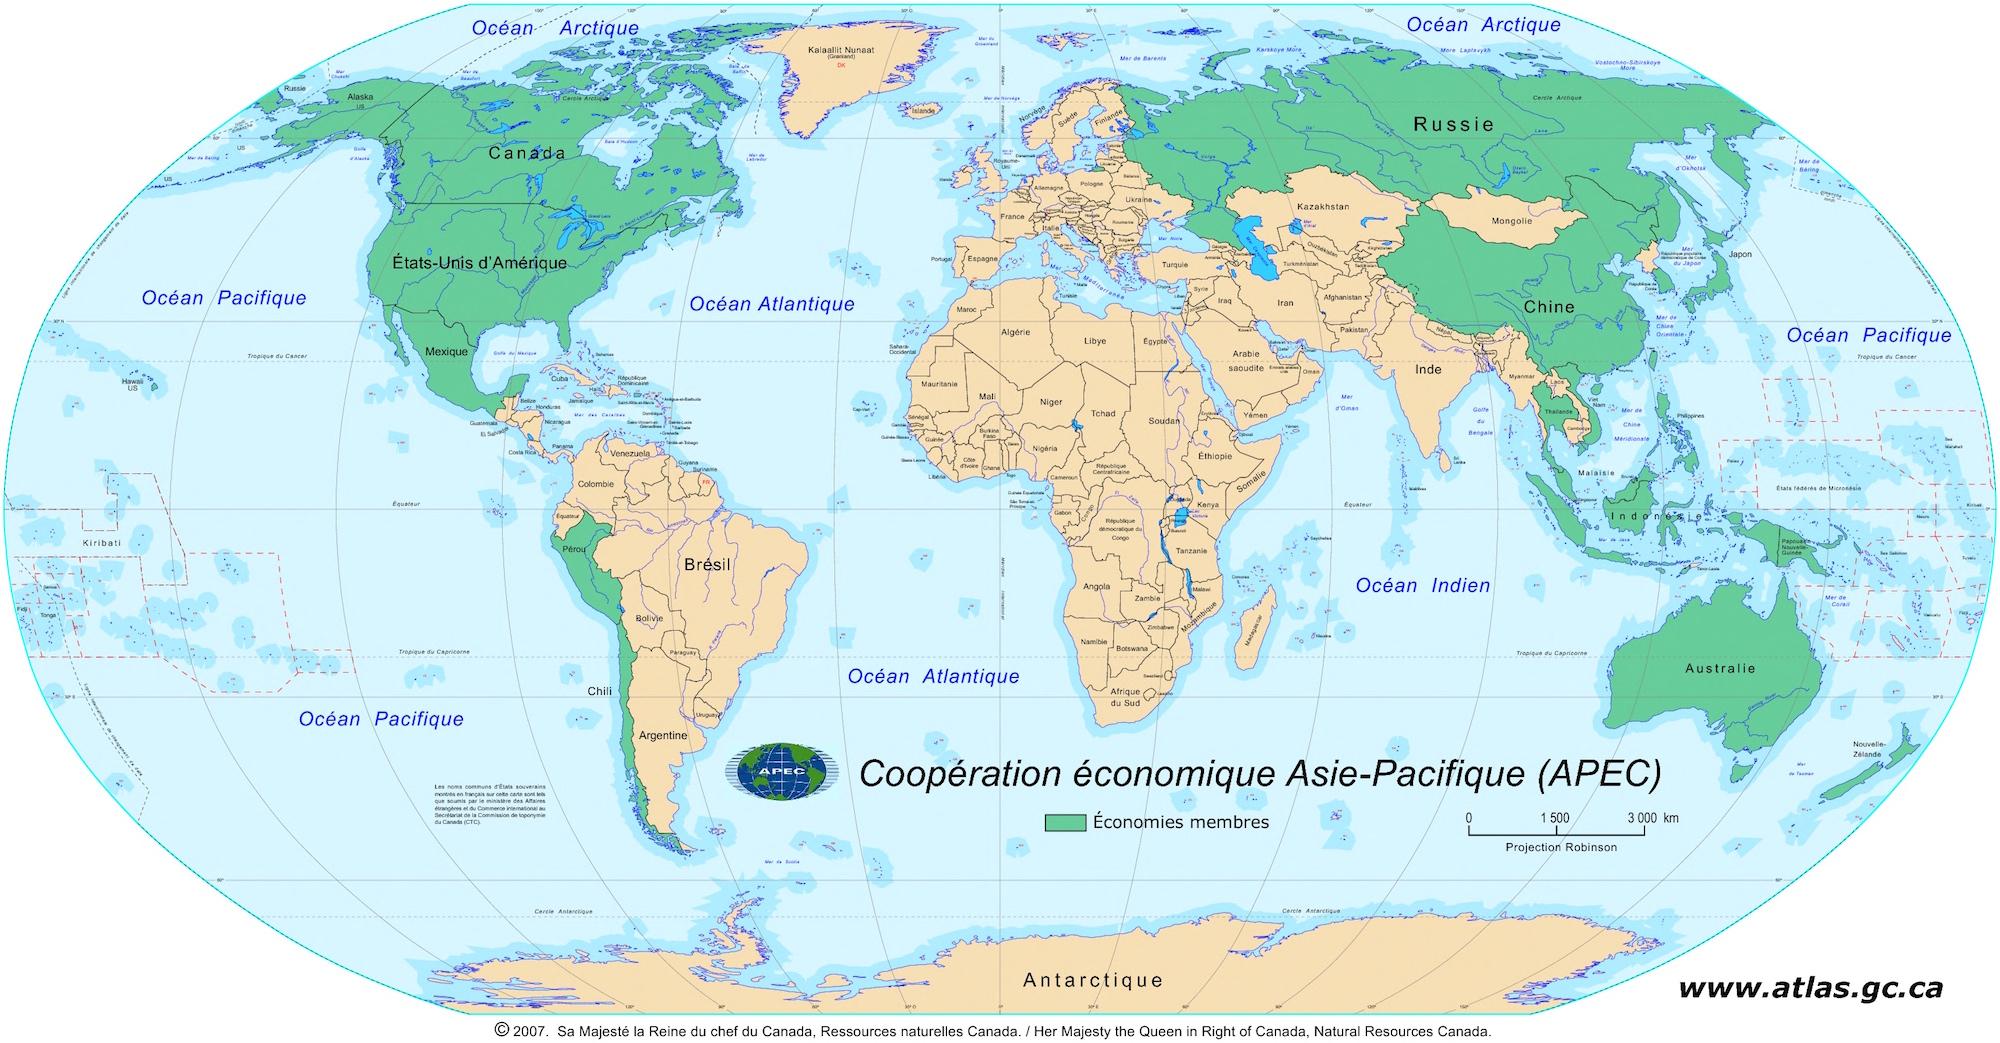 Préférence Monde - APEC • Carte • PopulationData.net XL67